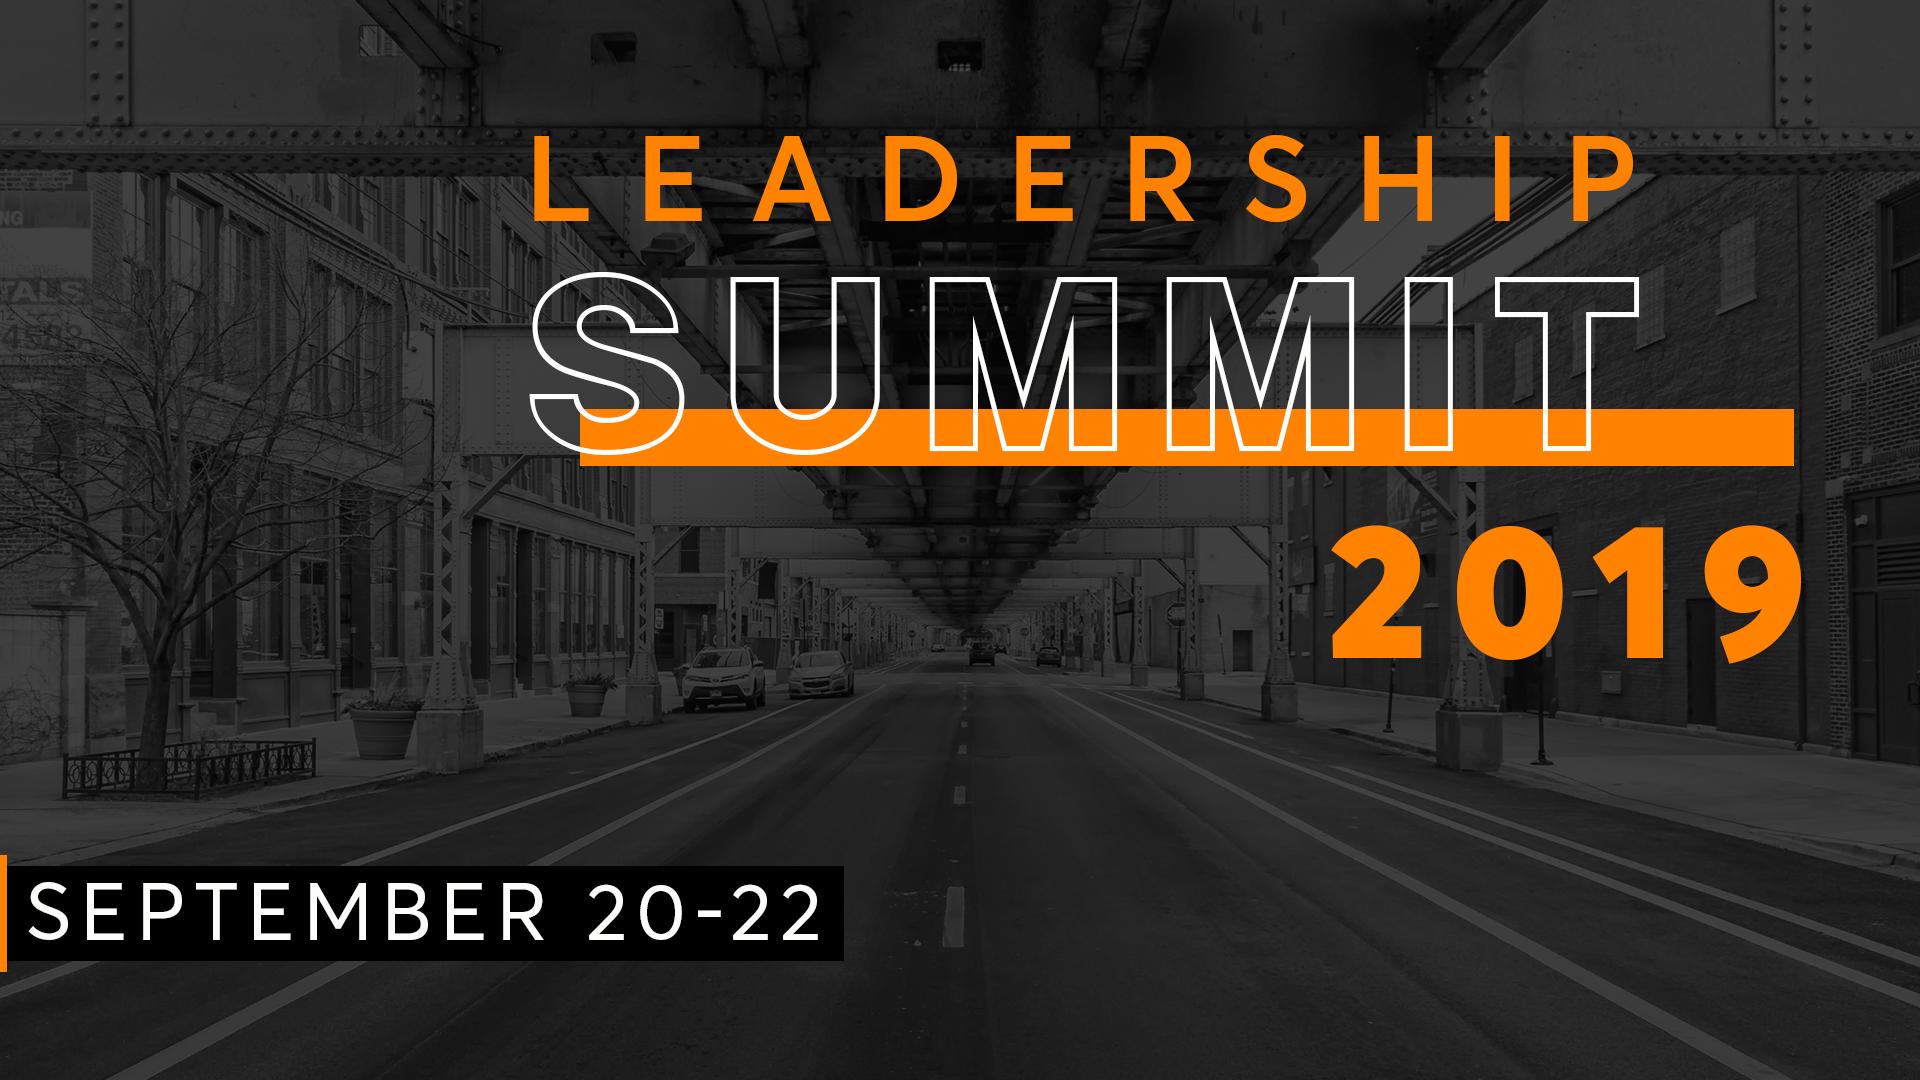 LEADERSHIP SUMMIT 2019.png